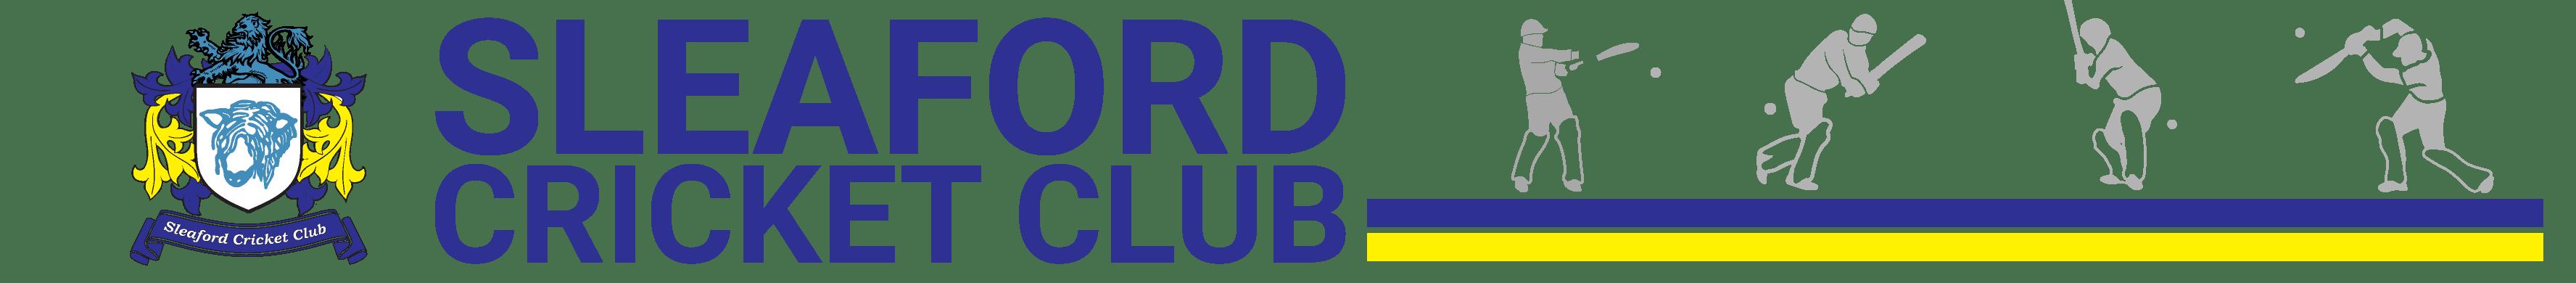 Sleaford-CC-Header-V5.0 (002)